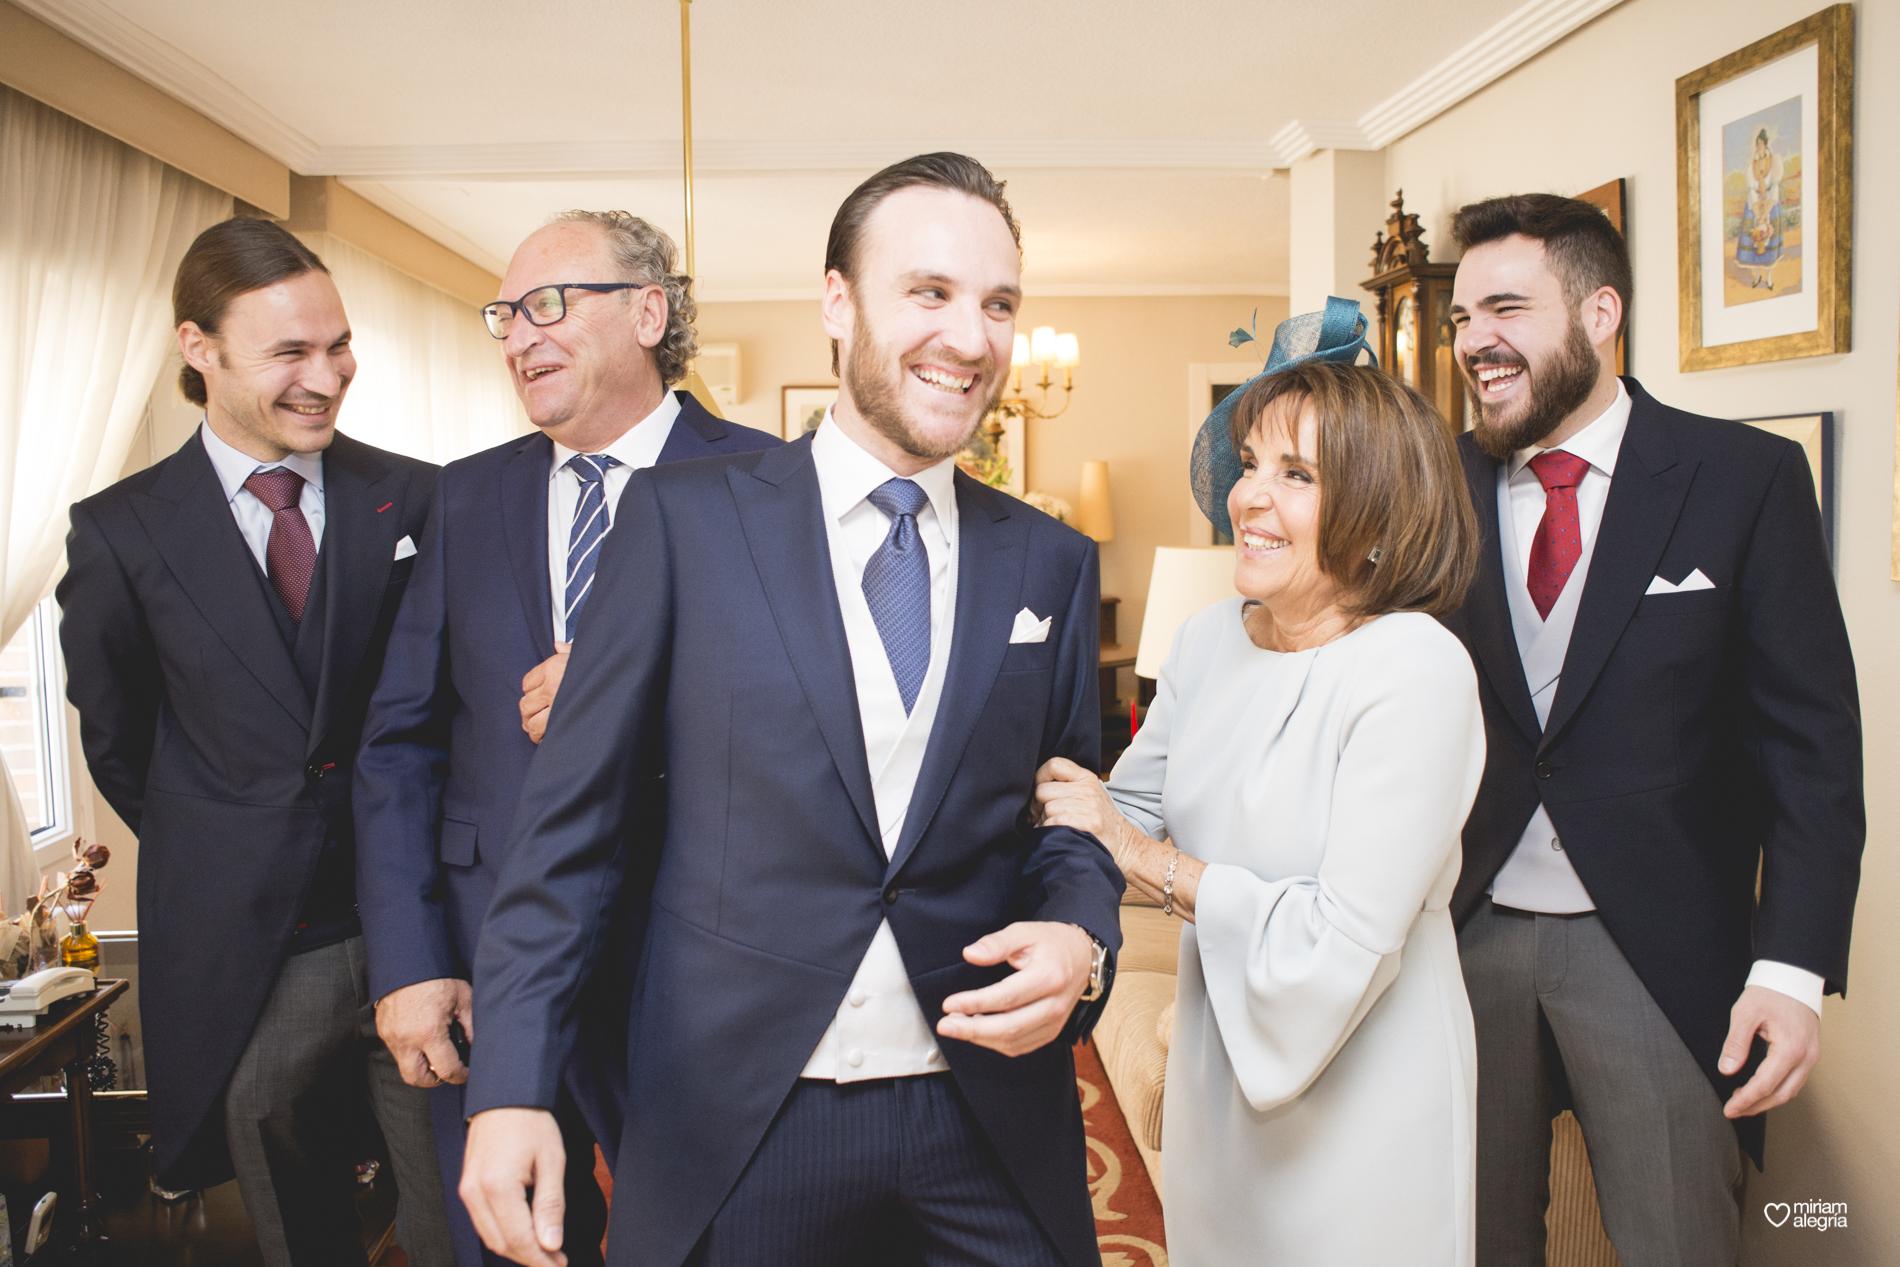 boda-en-la-catedral-de-murcia-miriam-alegria-fotografos-boda-murcia-22